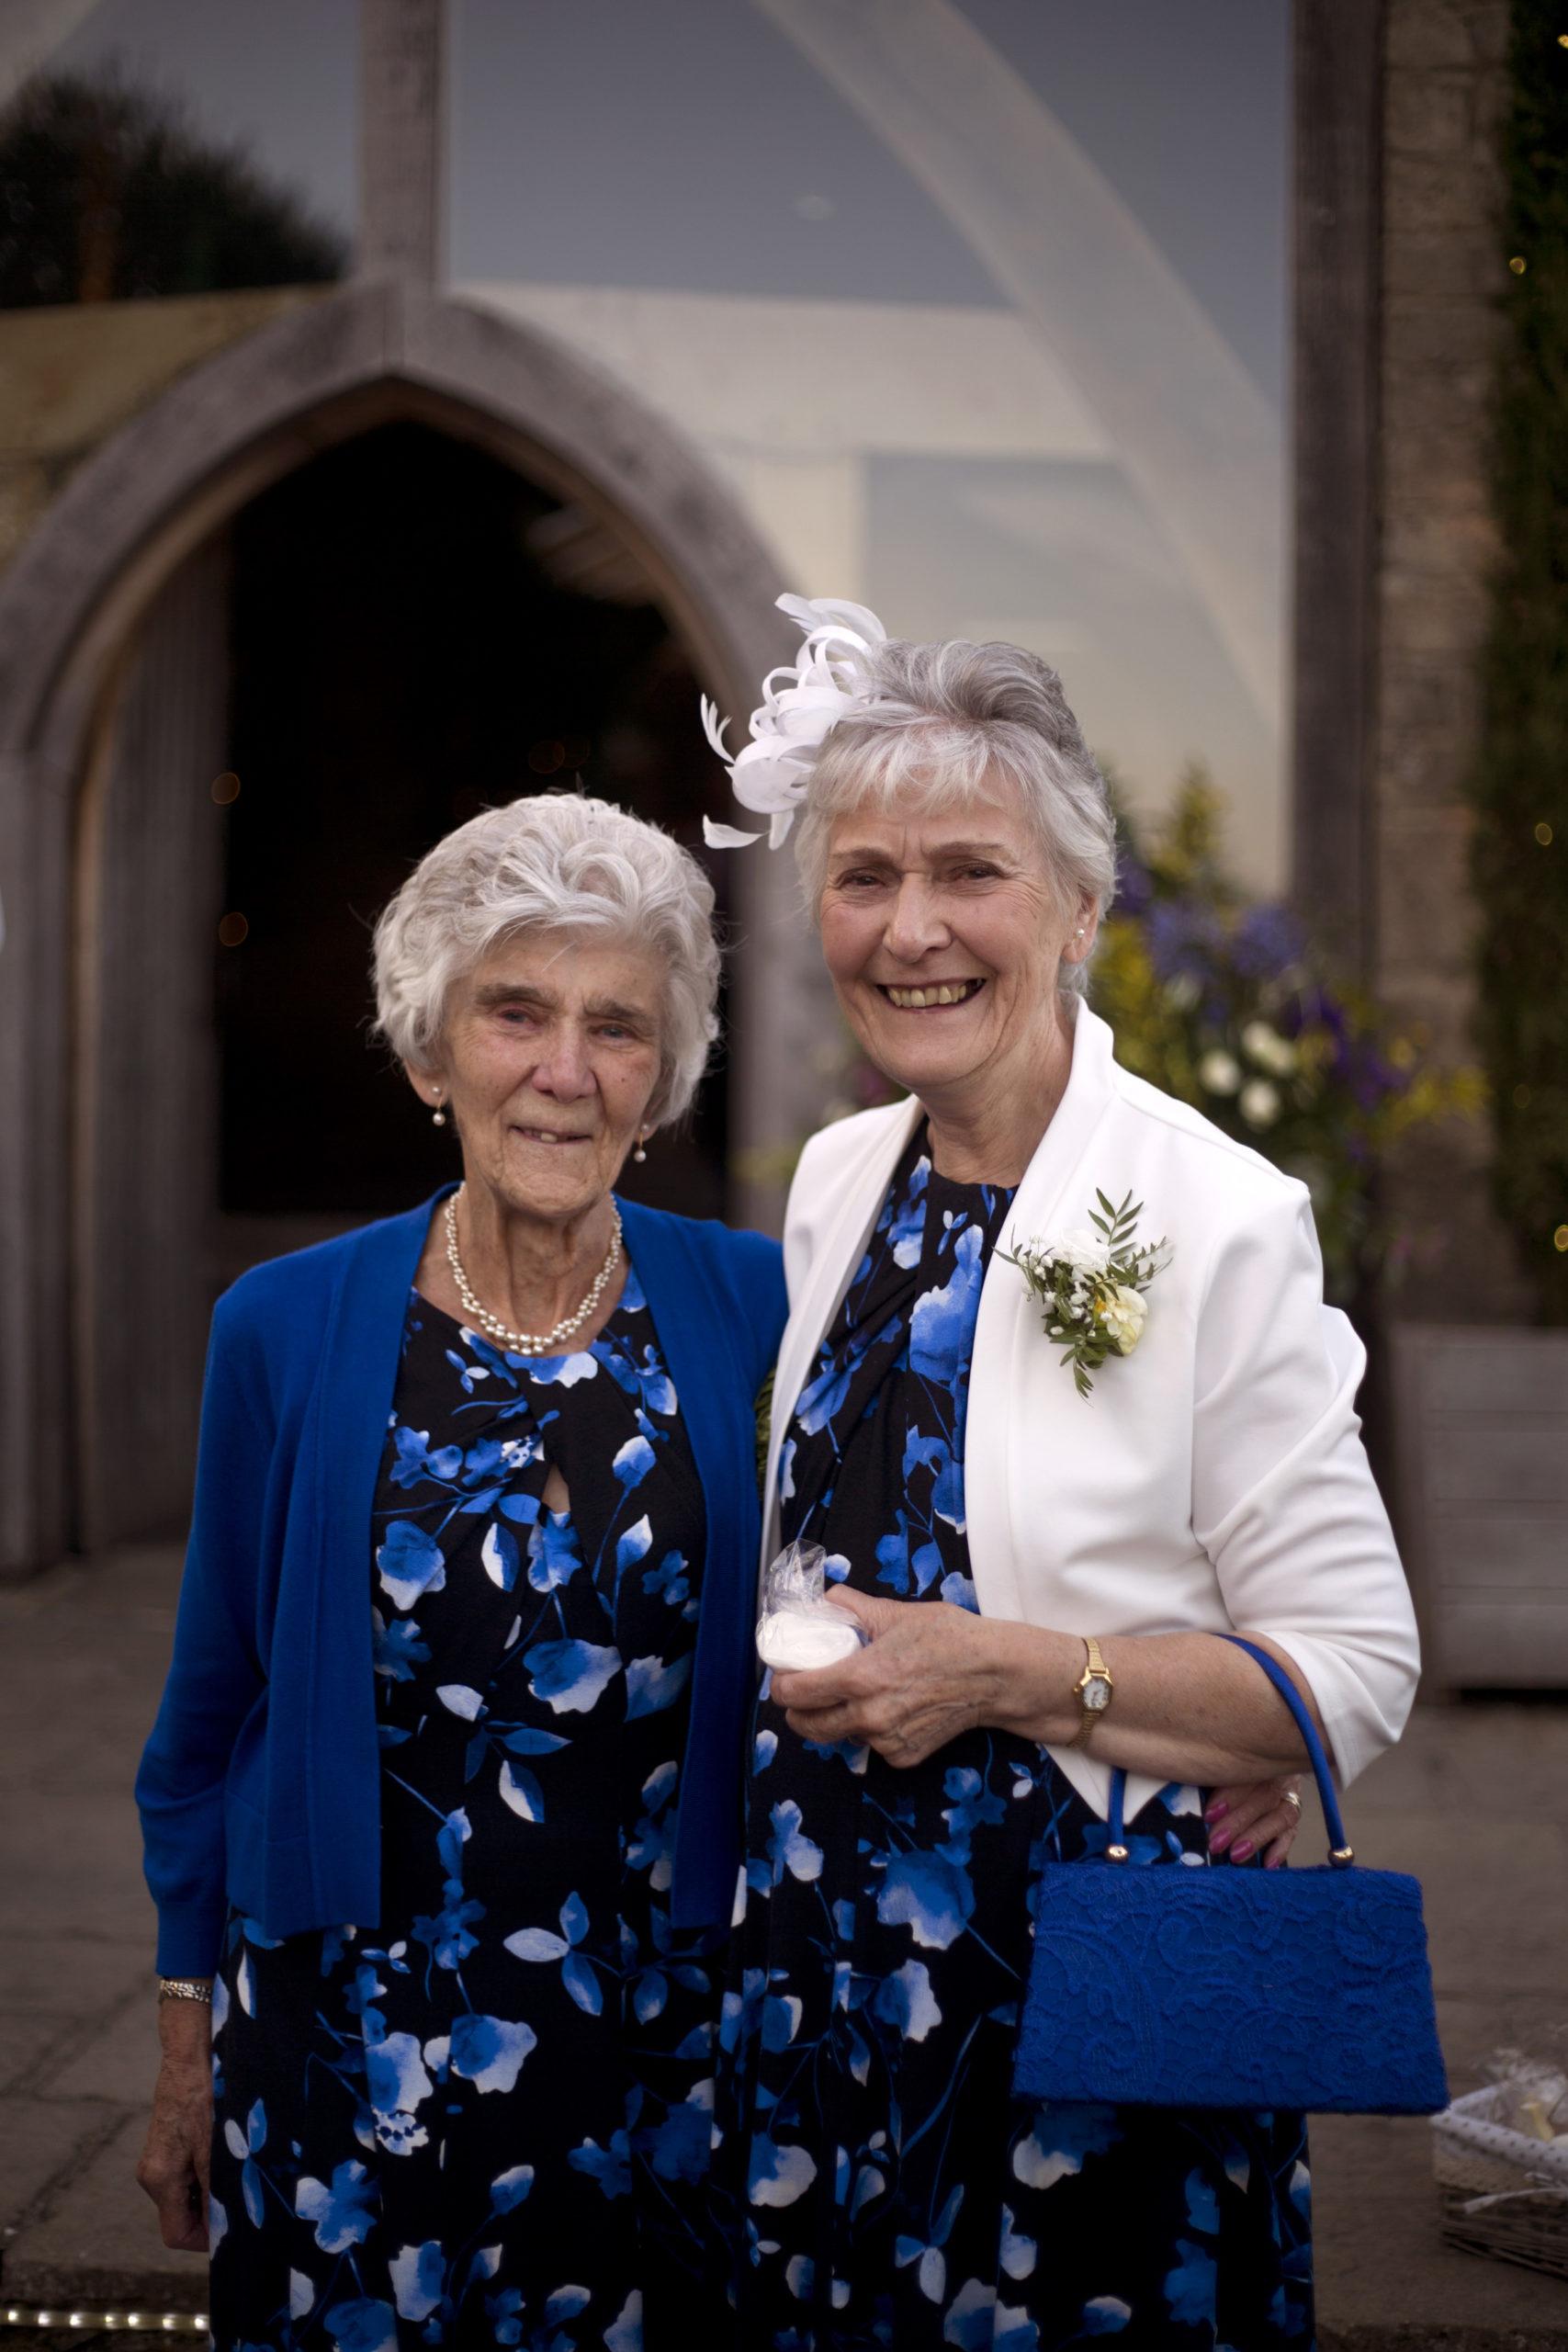 Grandmas at wedding wear the same dress portrait Cripps barn outdoor wedding photographer